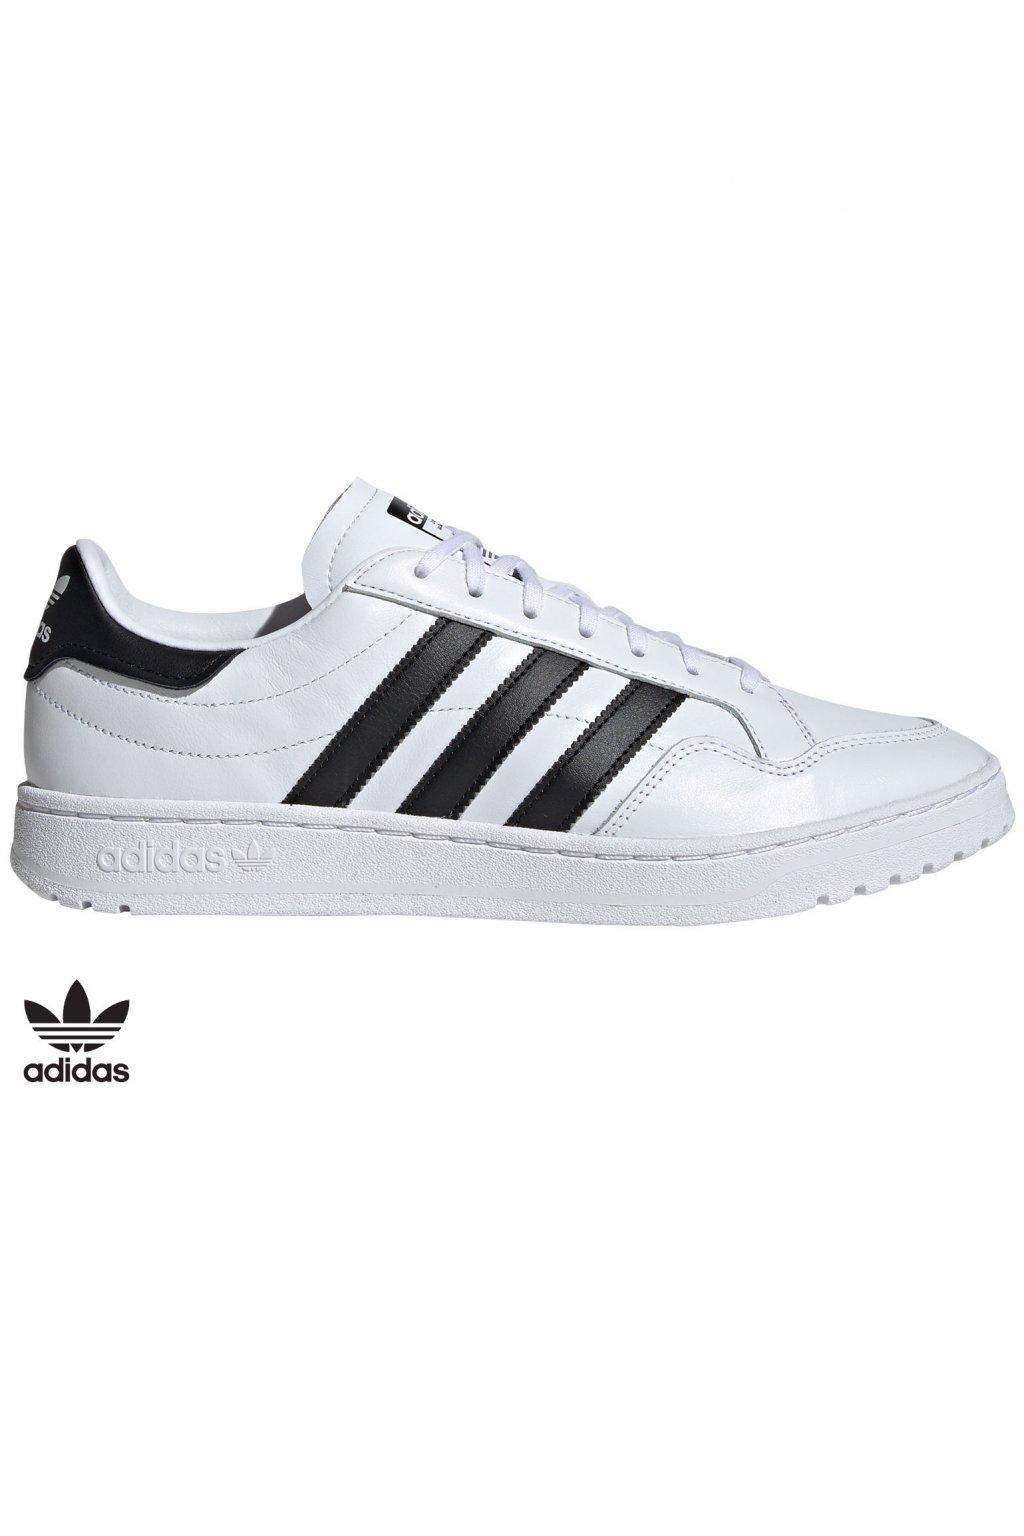 eg9734 tenisky adidas team court white